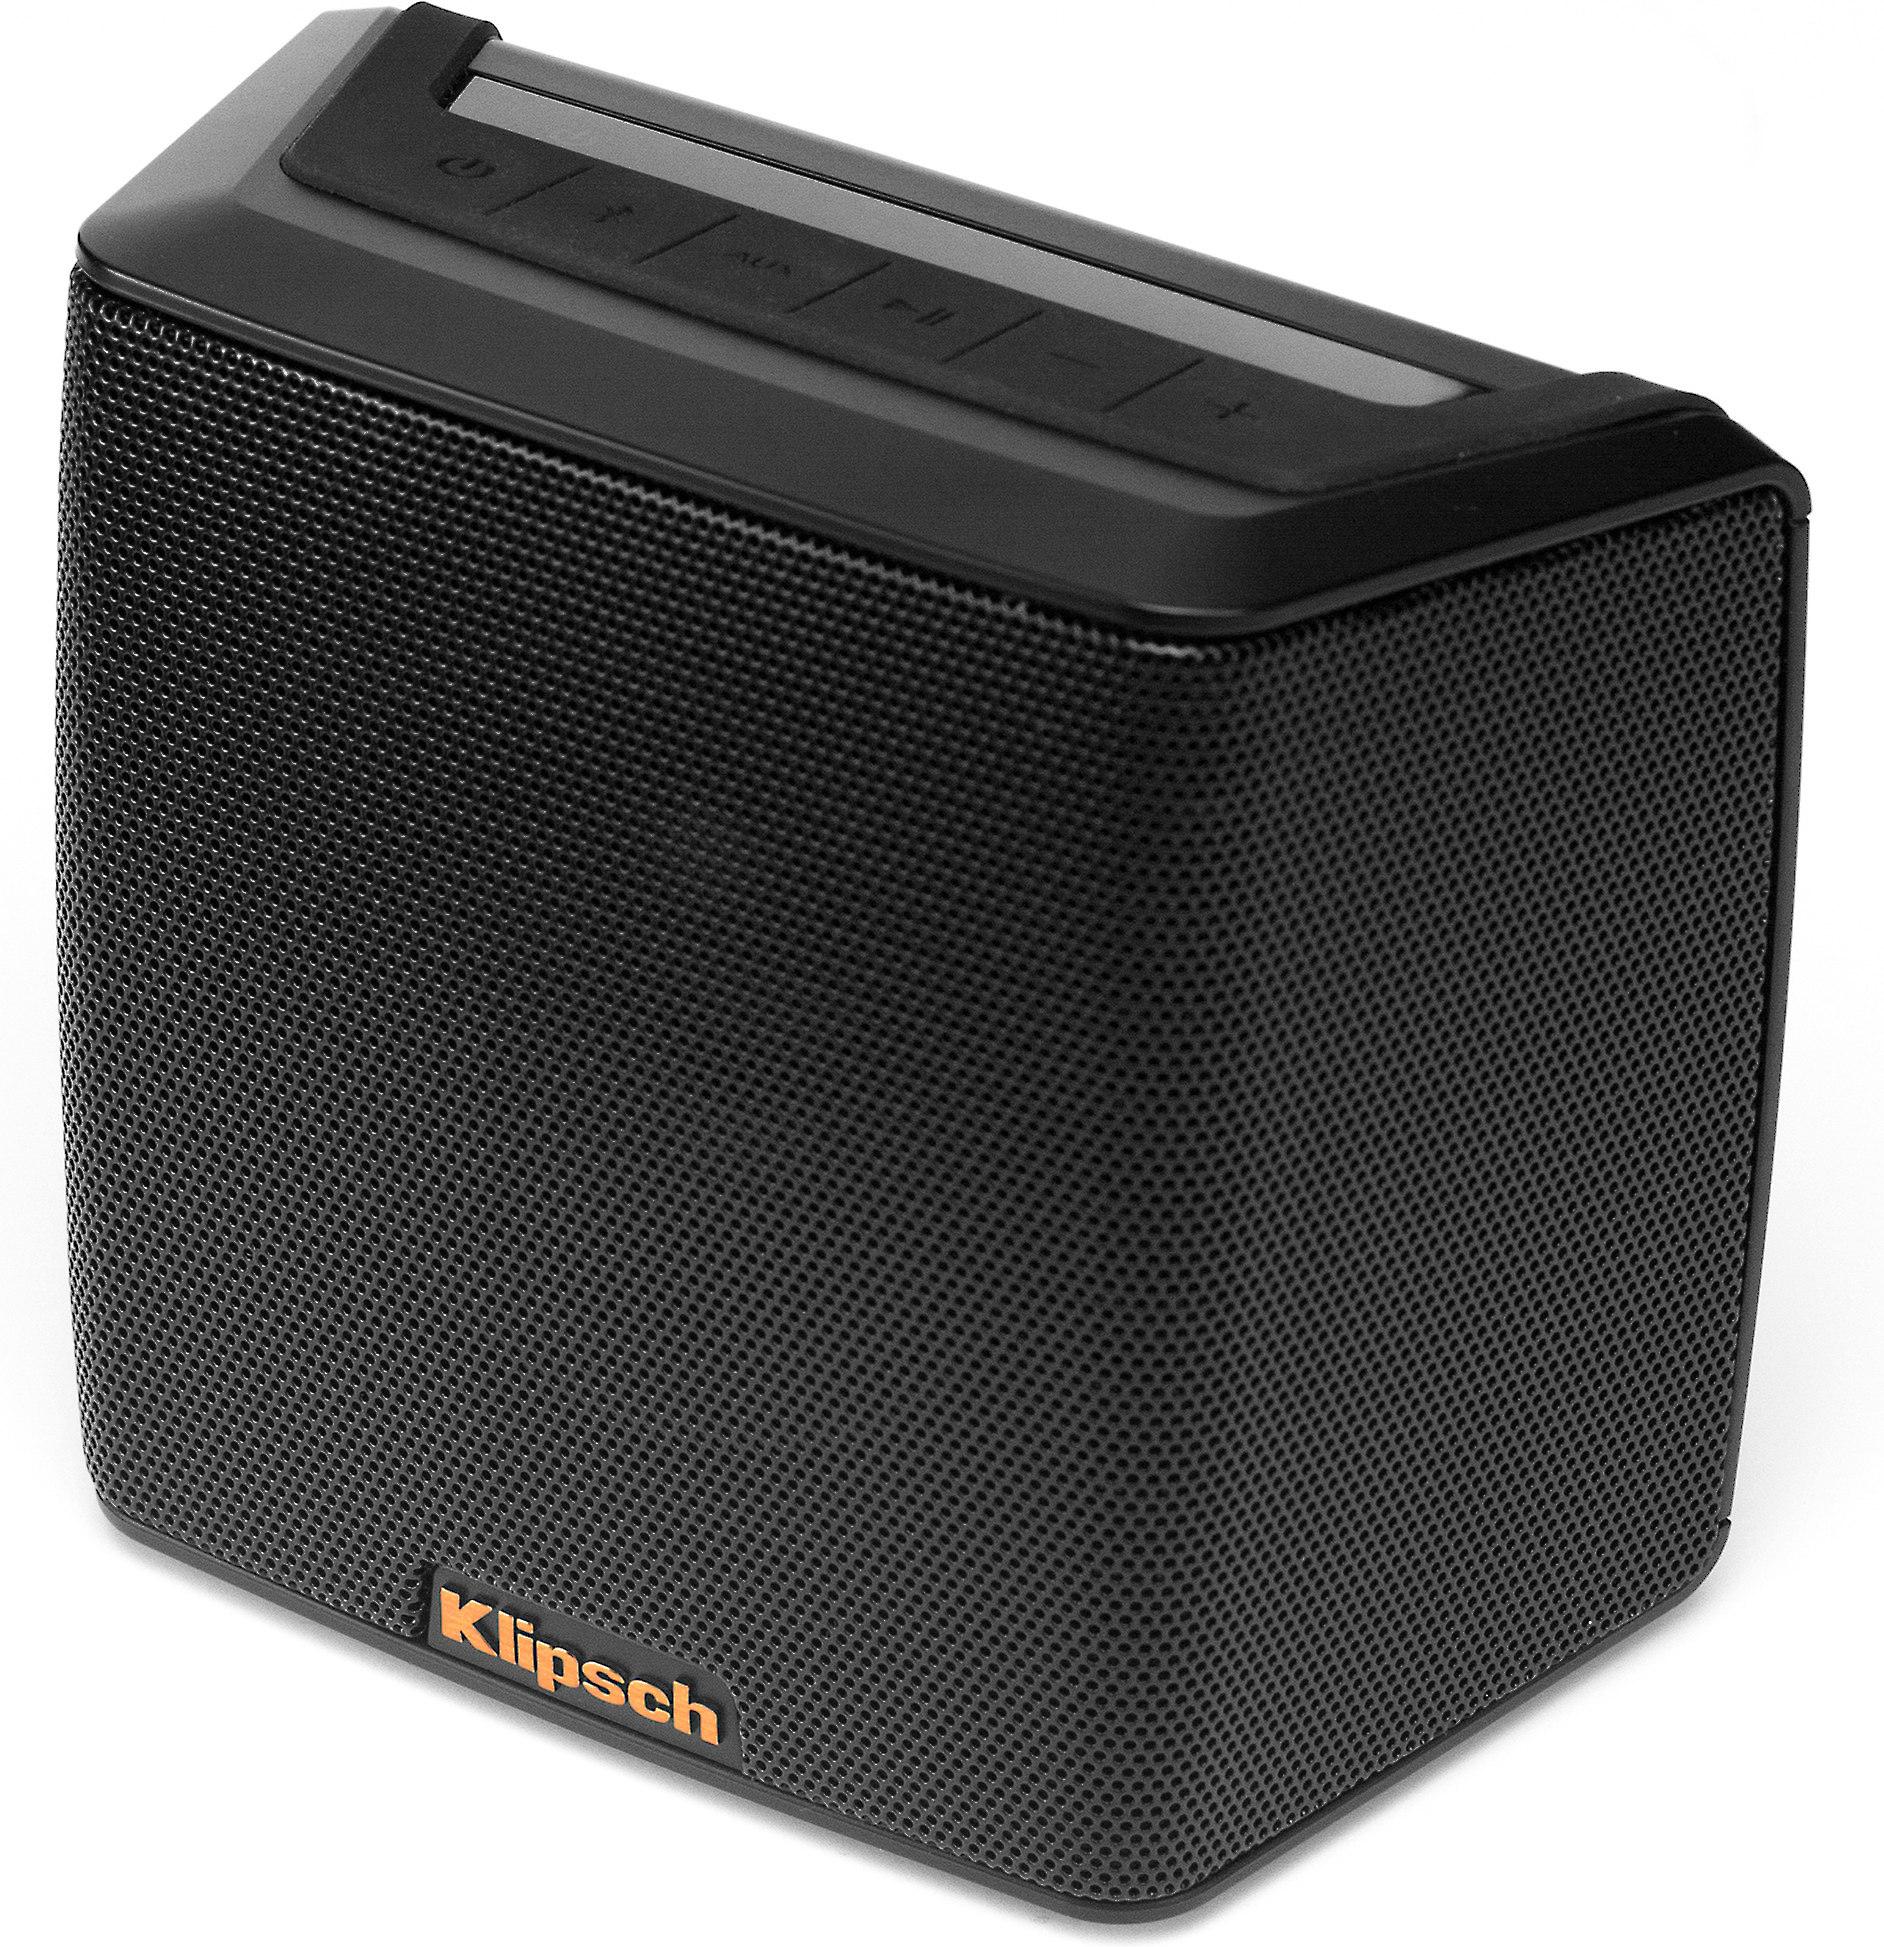 Klipsch® Groove® Splash-proof portable Bluetooth® speaker at Crutchfield